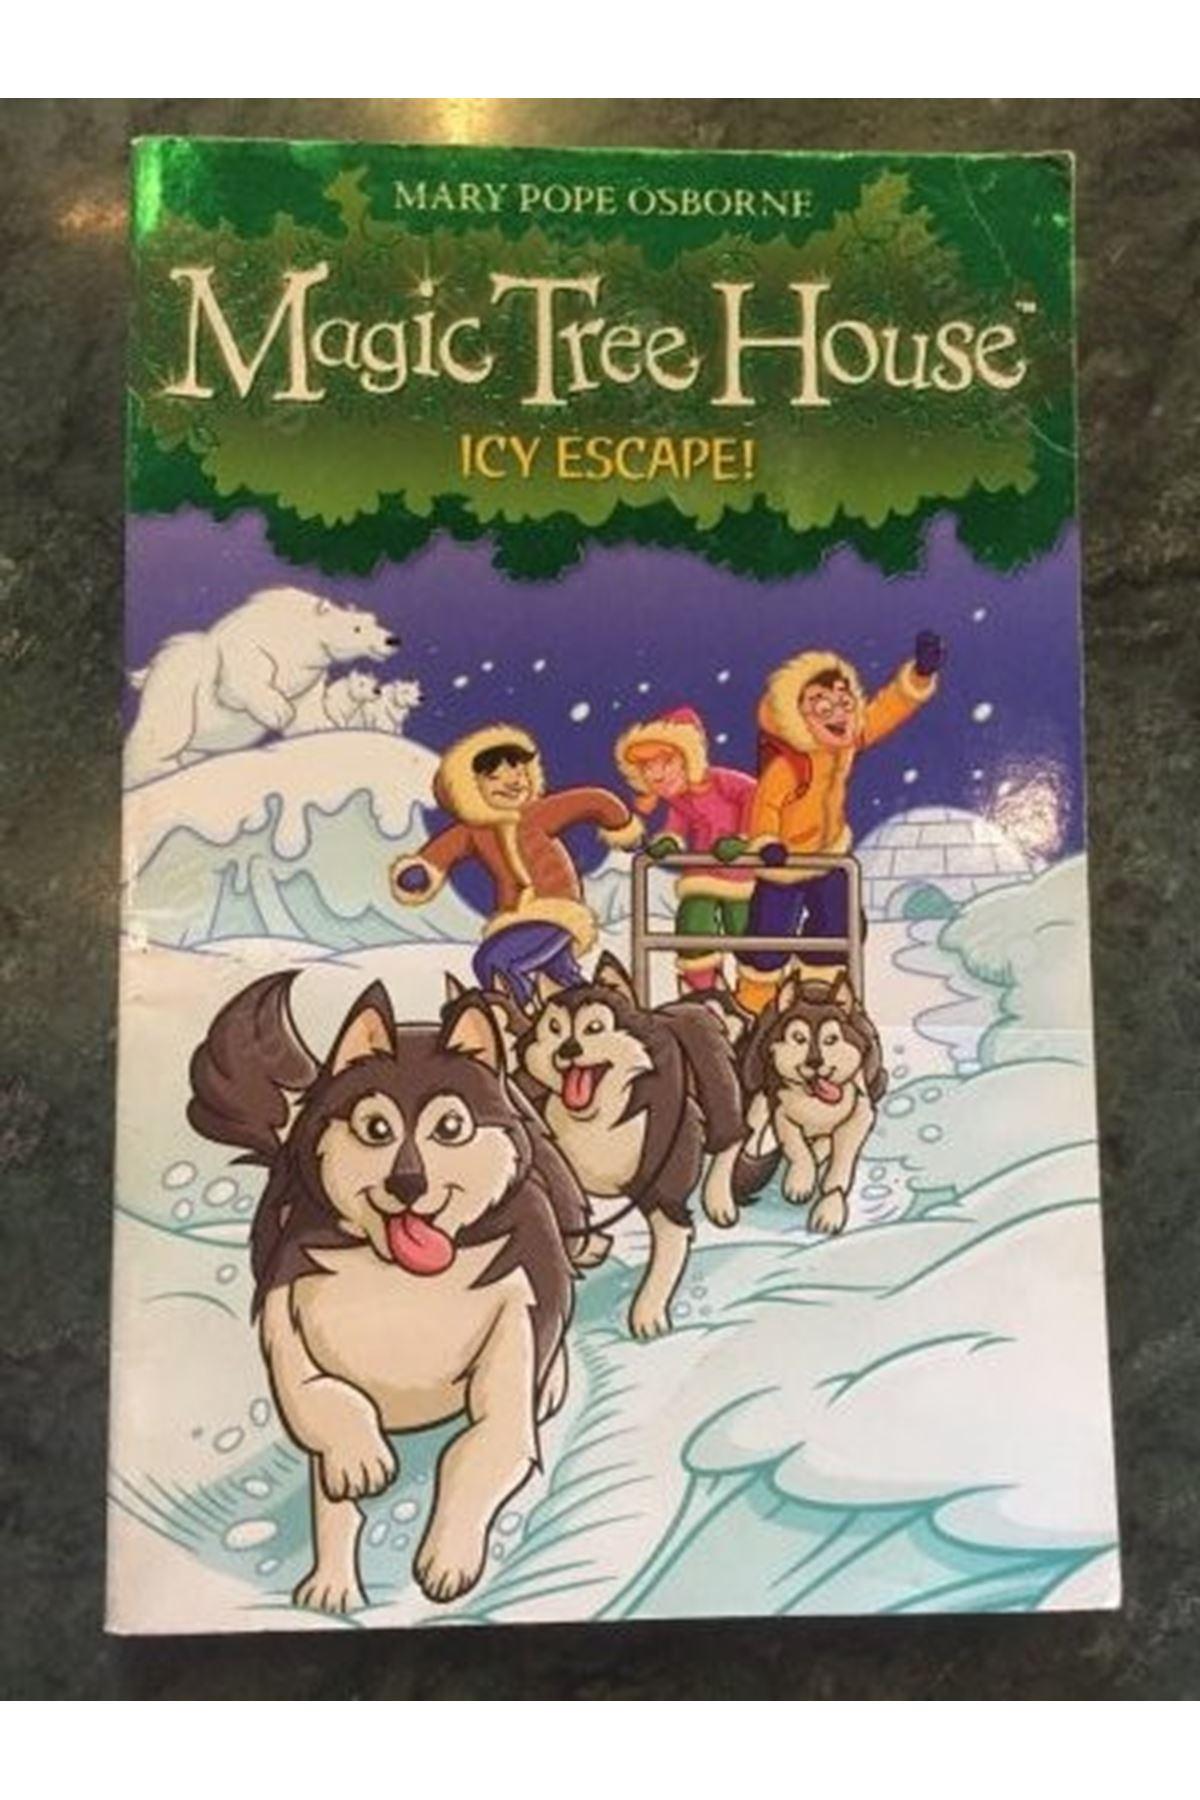 ICY ESCAPE - MAGIC TREE HOUSE